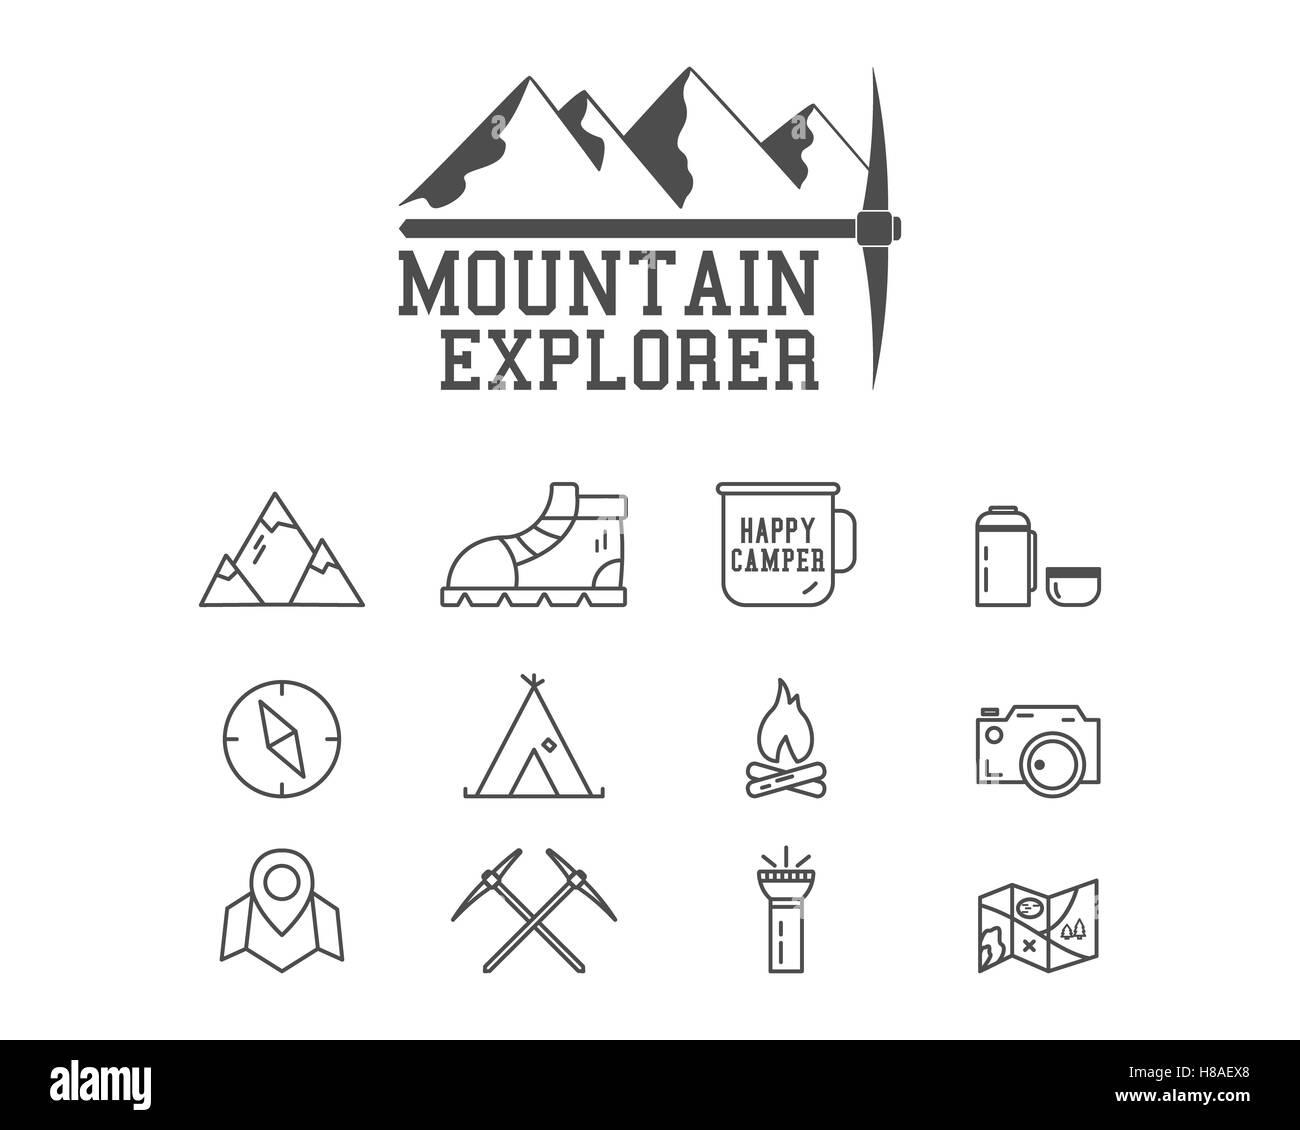 camping mountain explorer camp badge logo template travel hiking